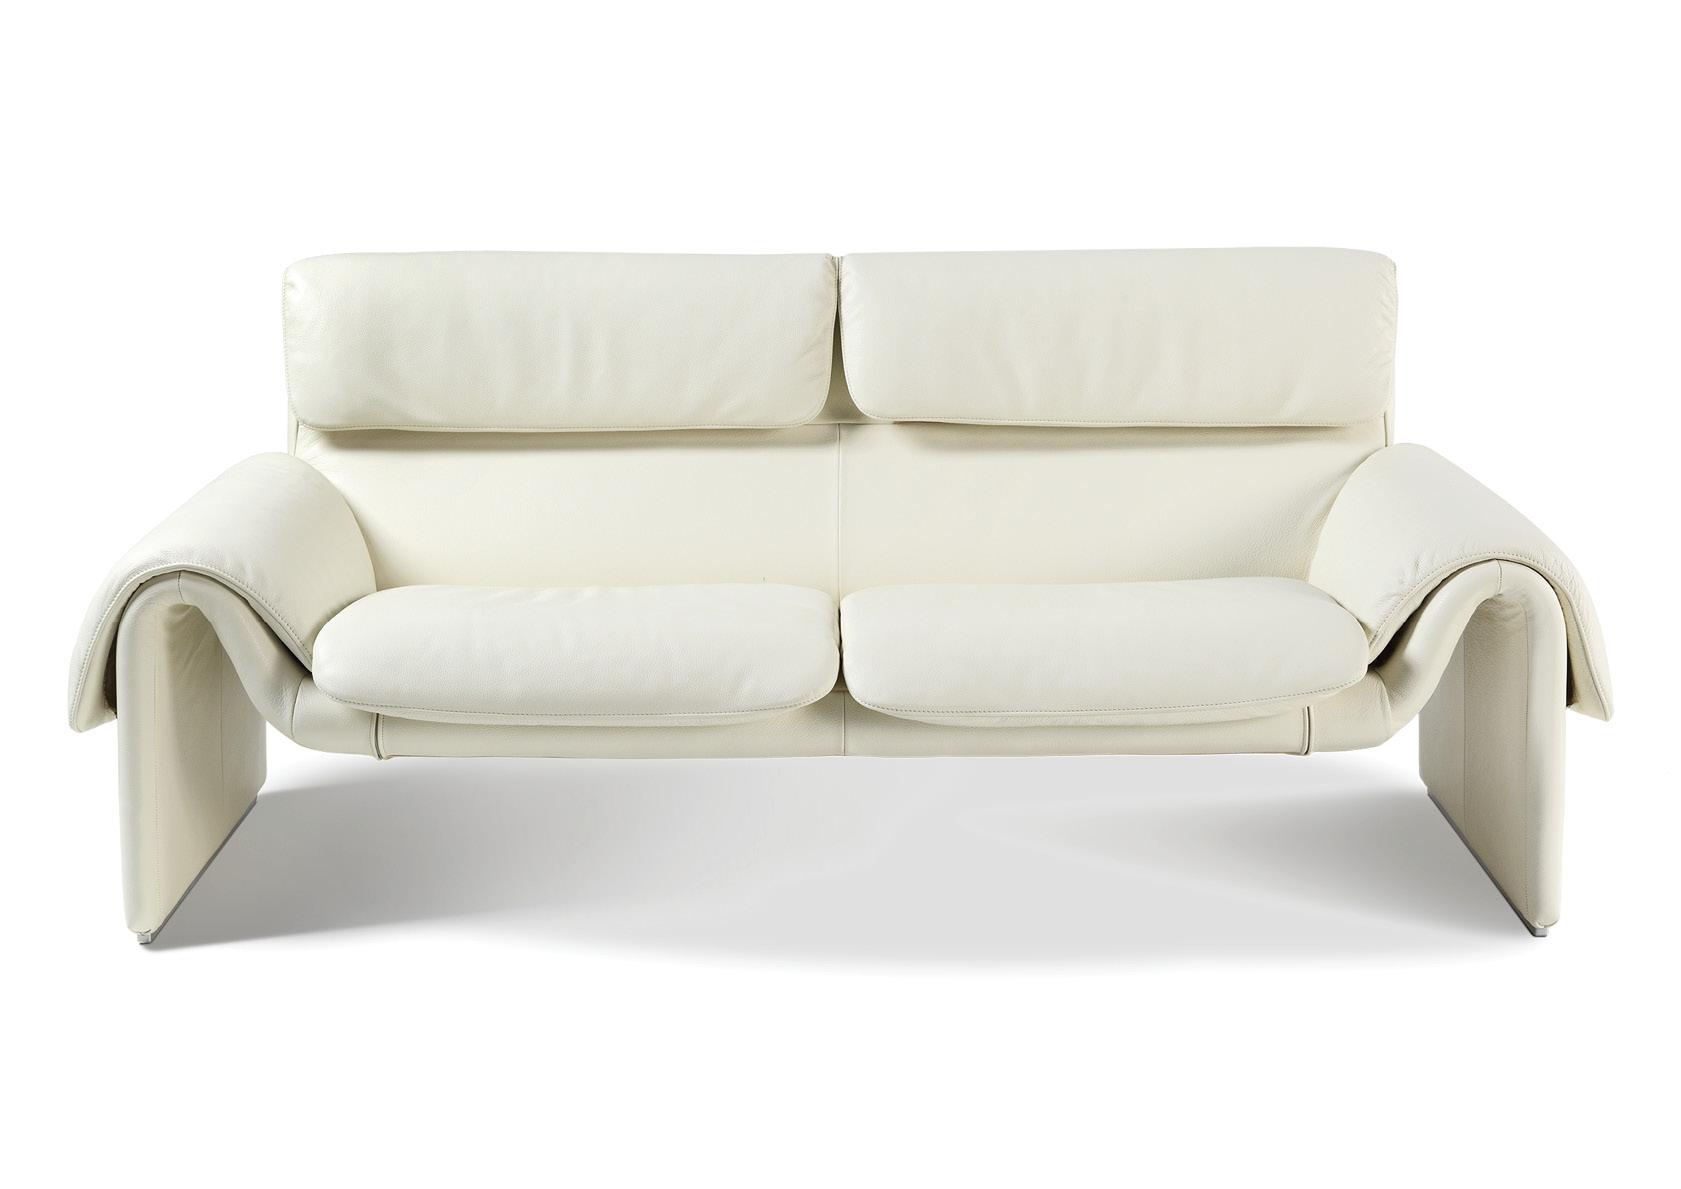 lugano sofa m bel dau gmbh in schliengen. Black Bedroom Furniture Sets. Home Design Ideas